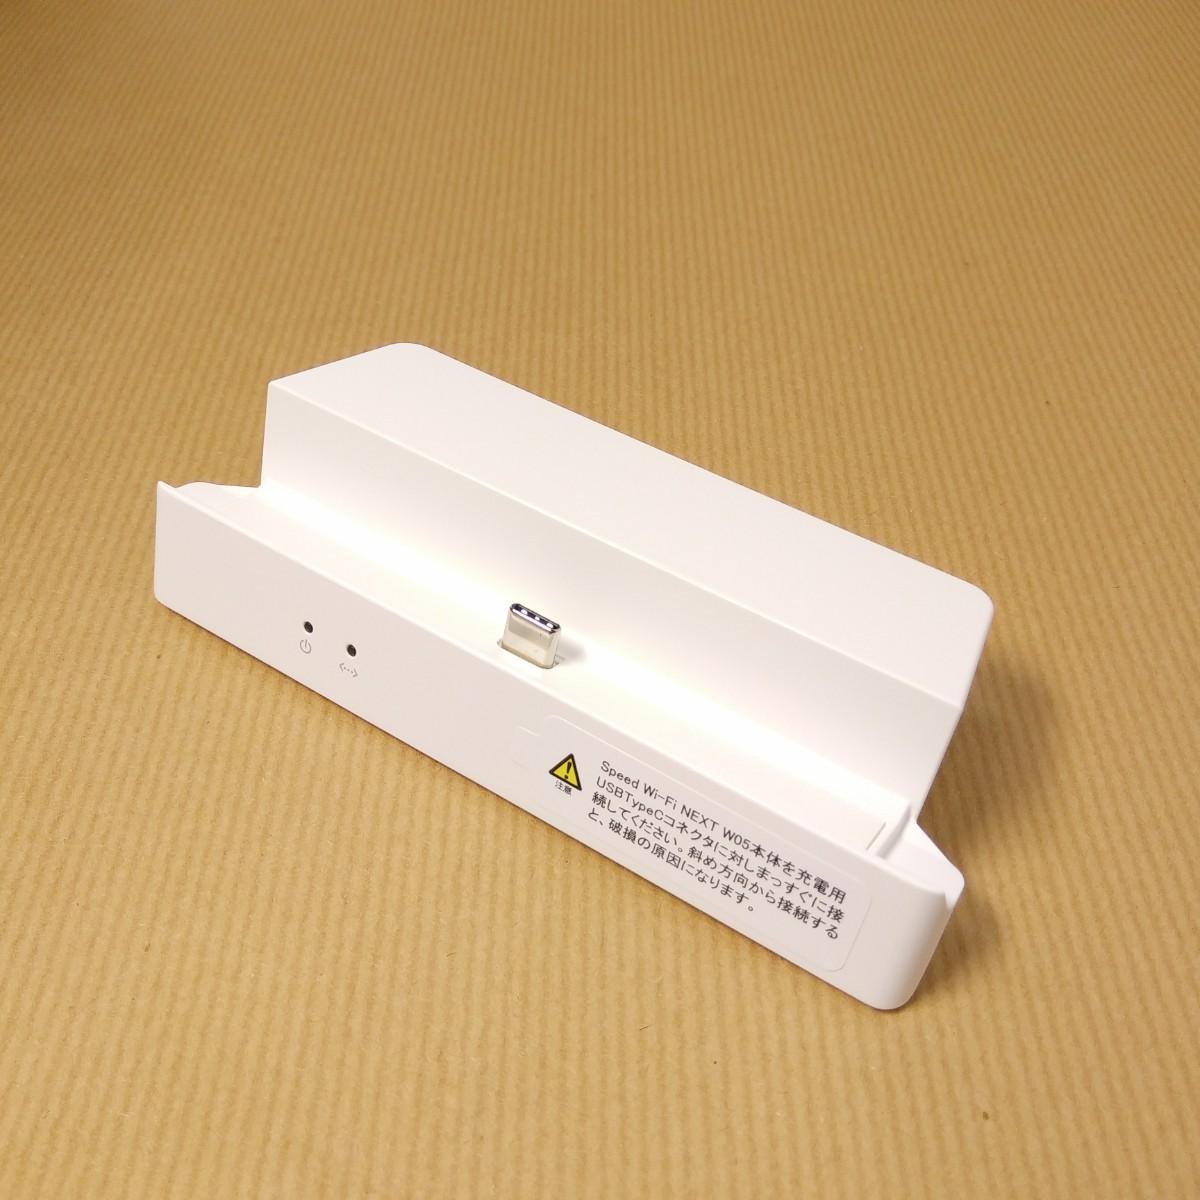 Speed Wi-Fi NEXT W05 専用クレードル HWD36PUU / HWD36PUA